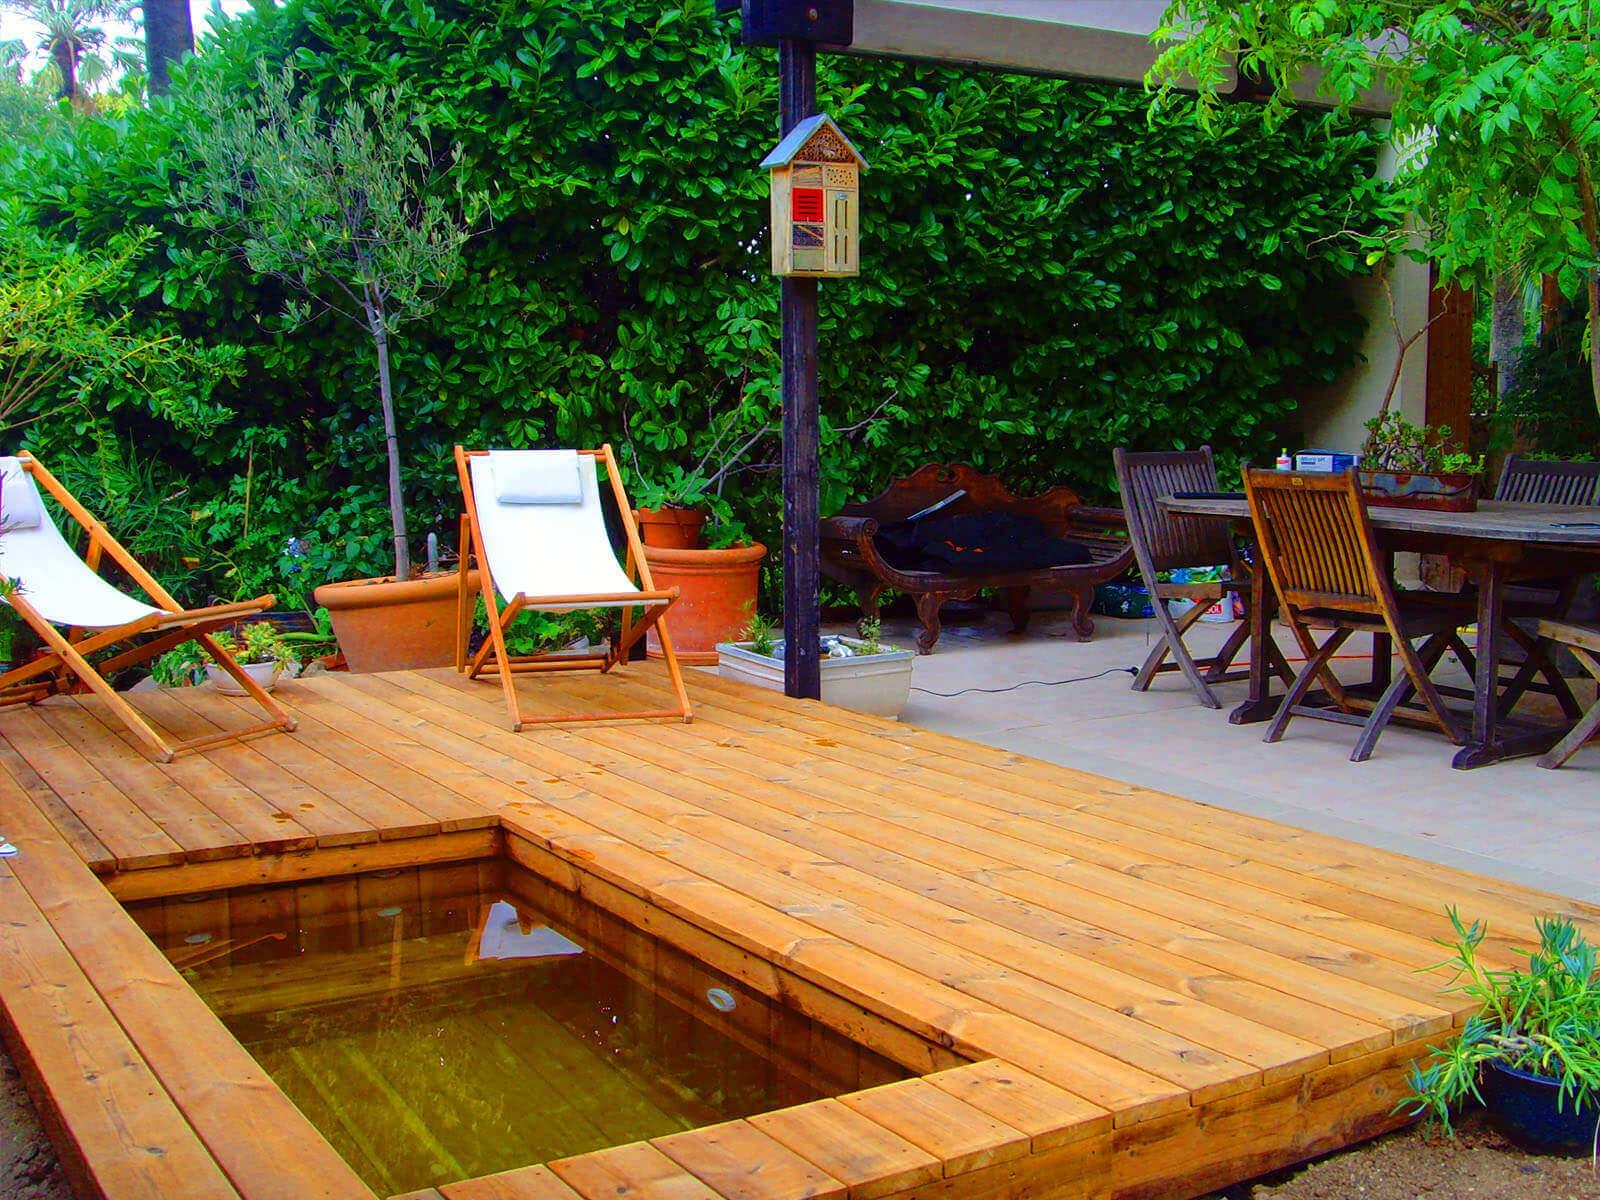 Mini Piscine Petit Jardin photos de petites piscines en bois sans liner odyssea piscines